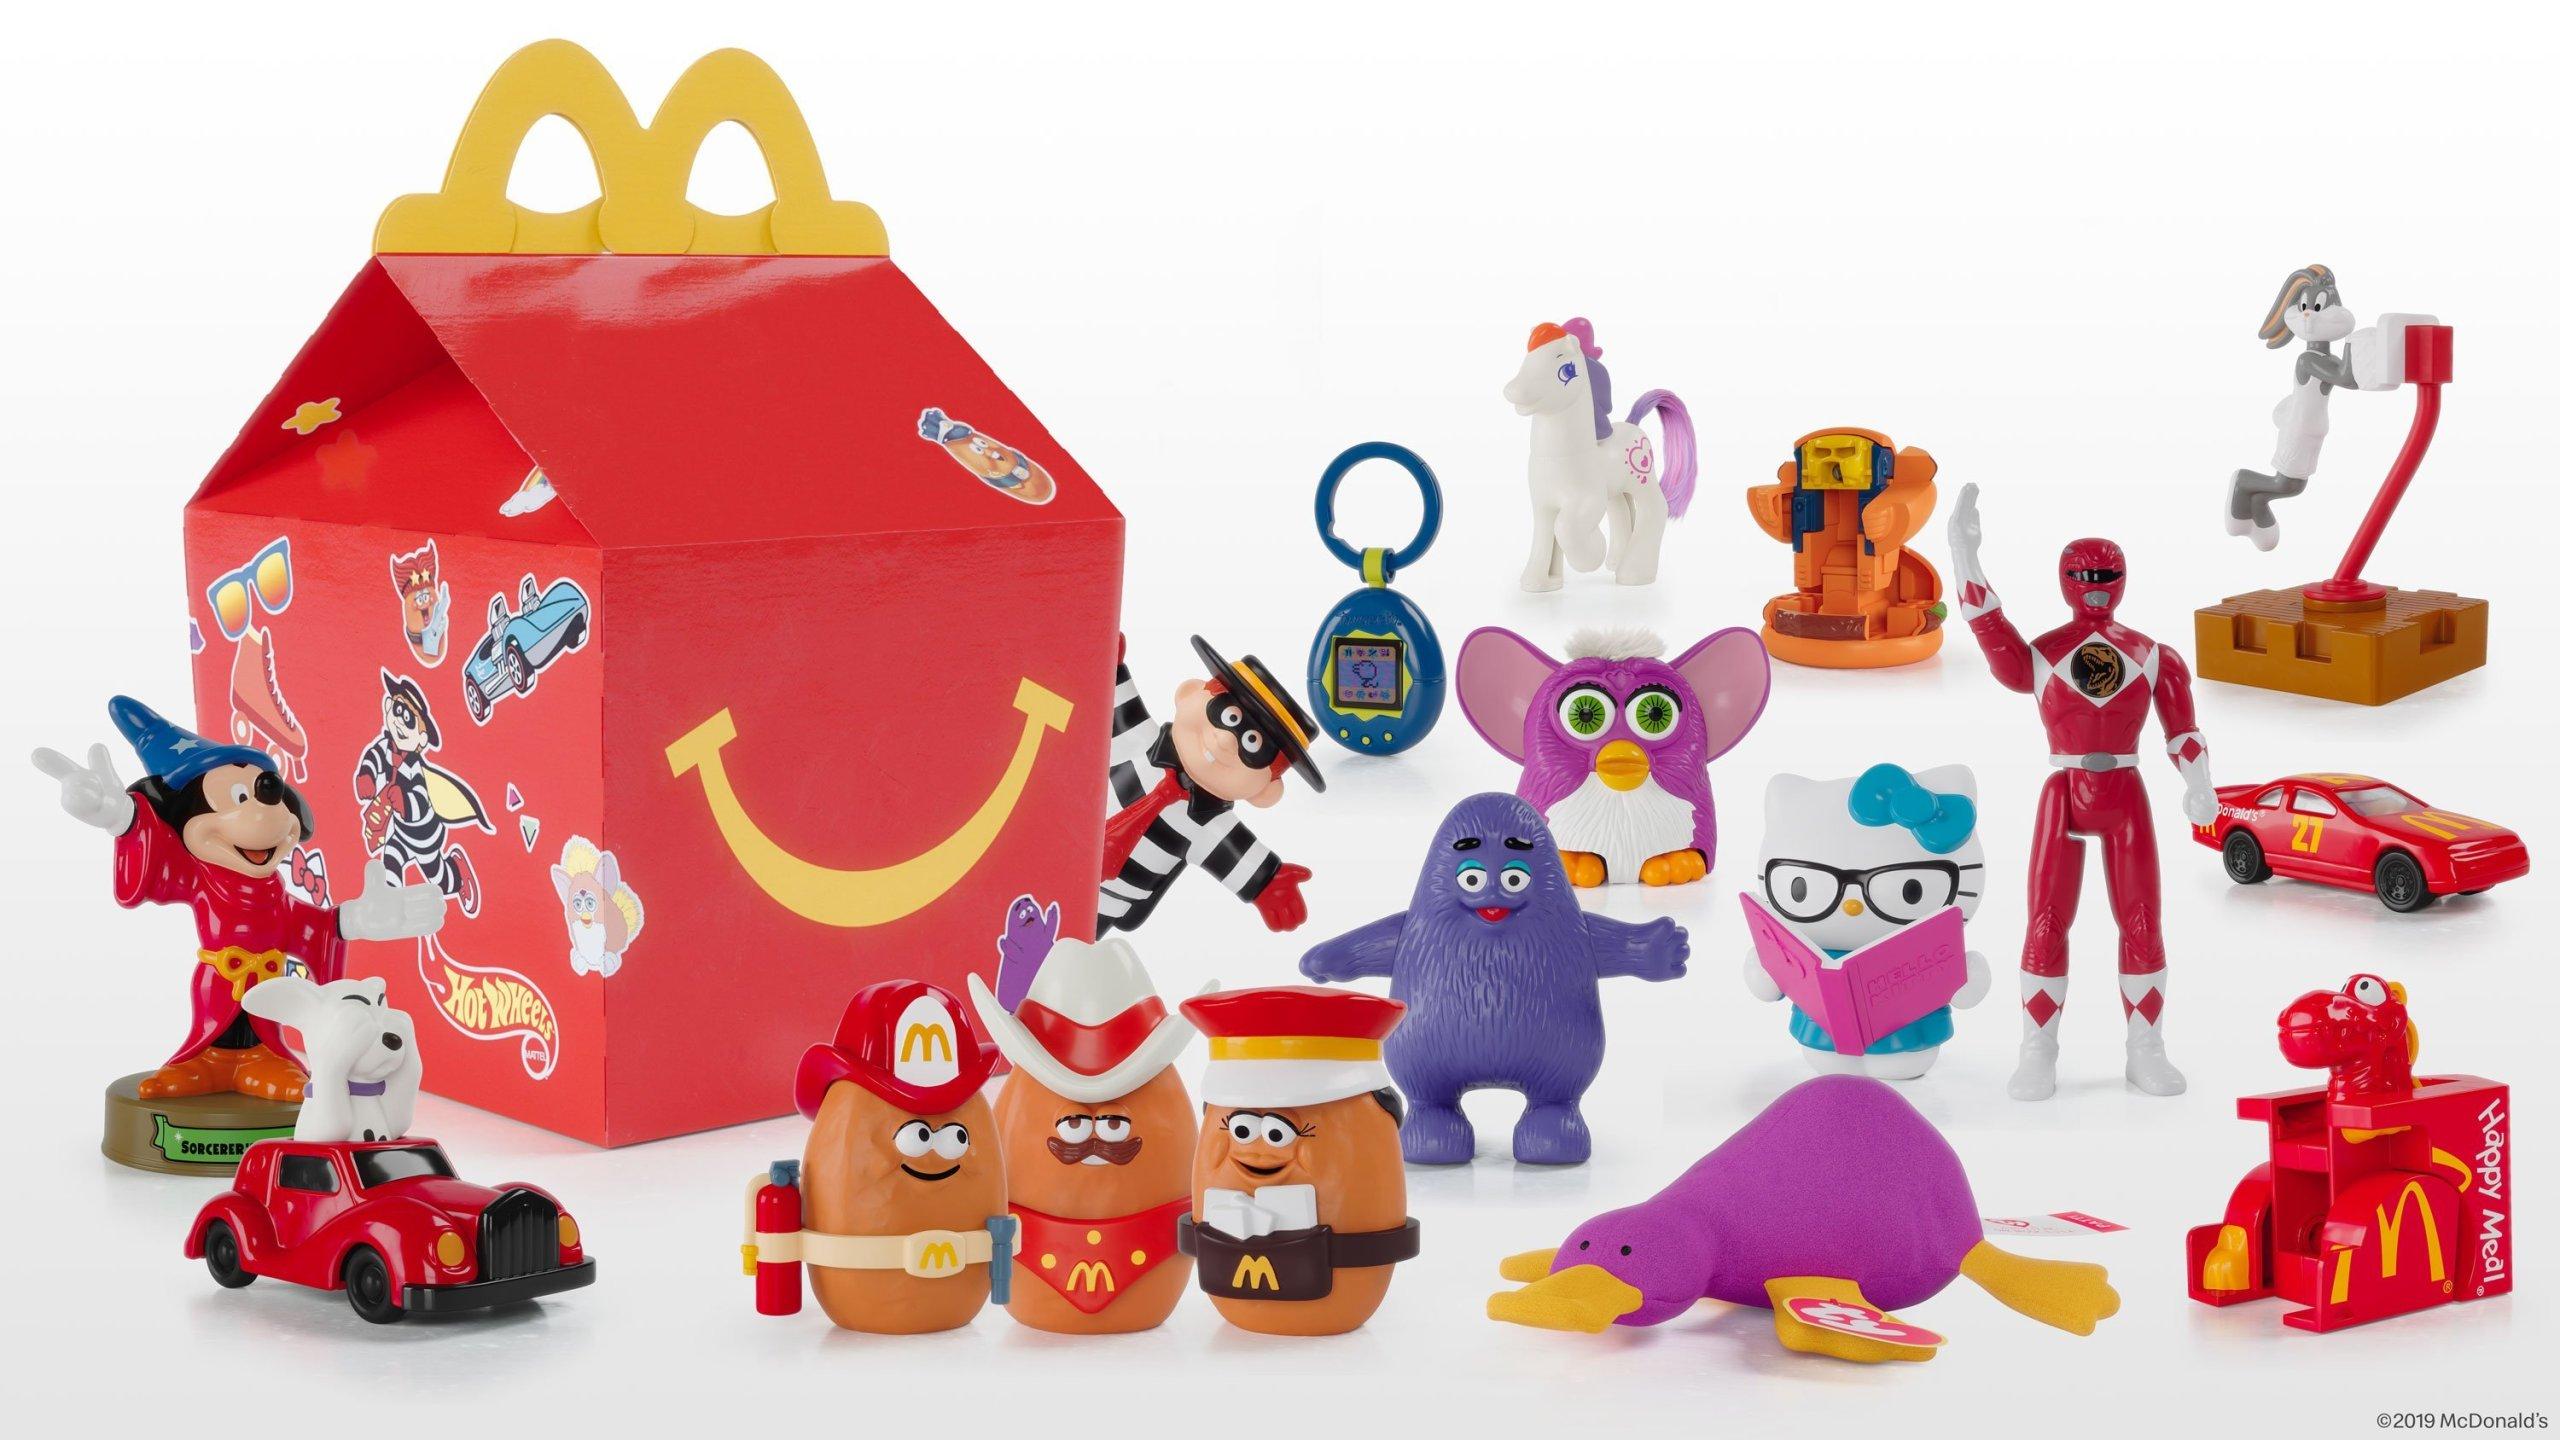 toy story 4 mcdonalds toys